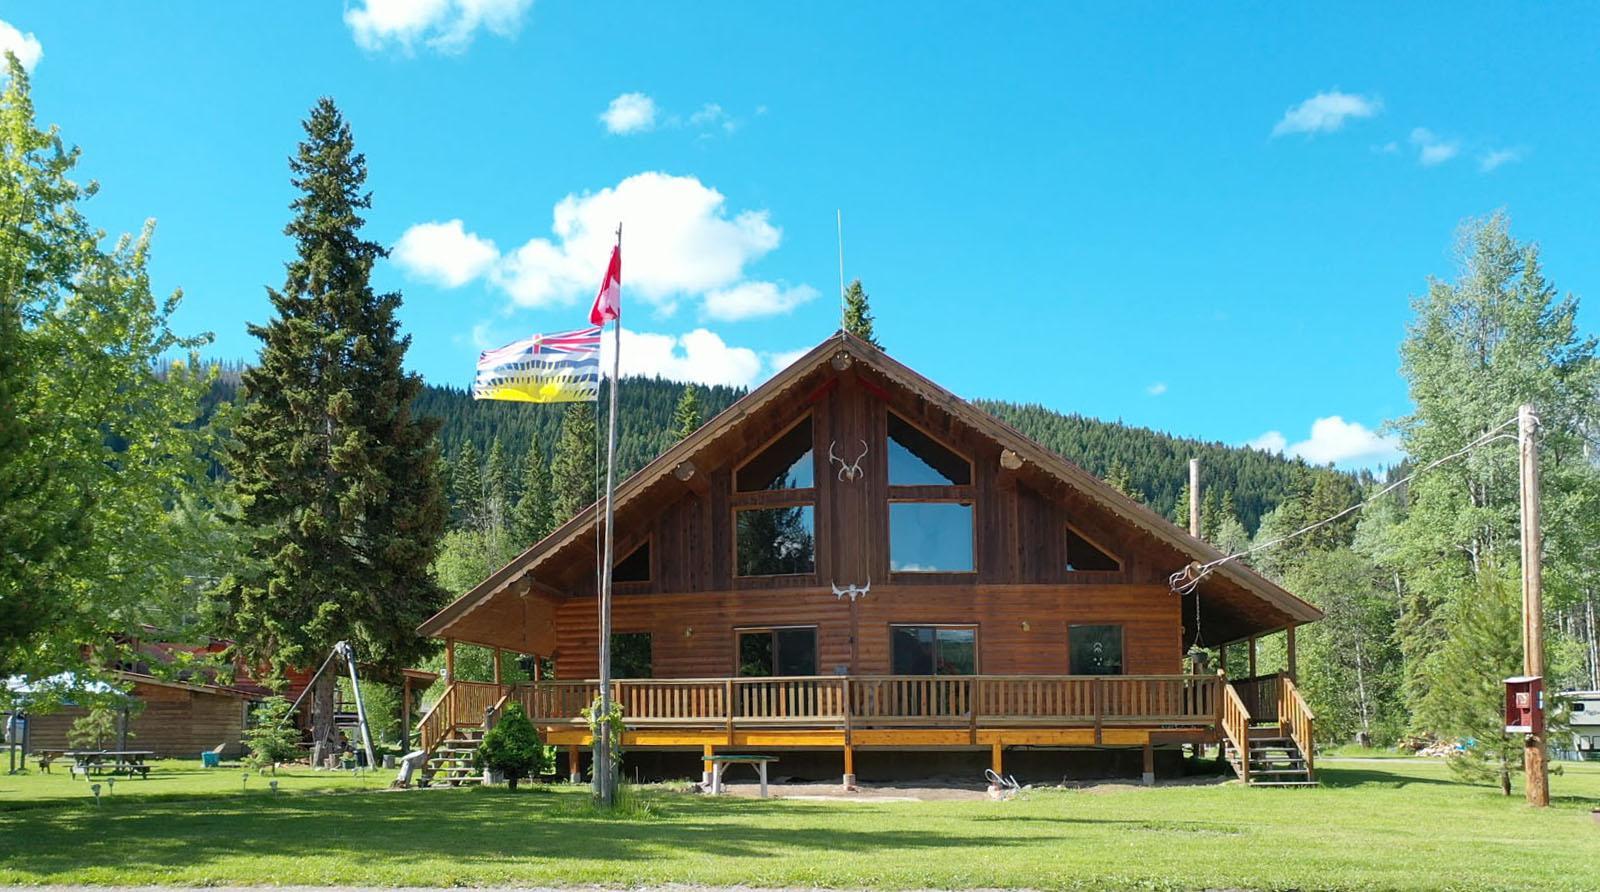 Canim lake resort 25